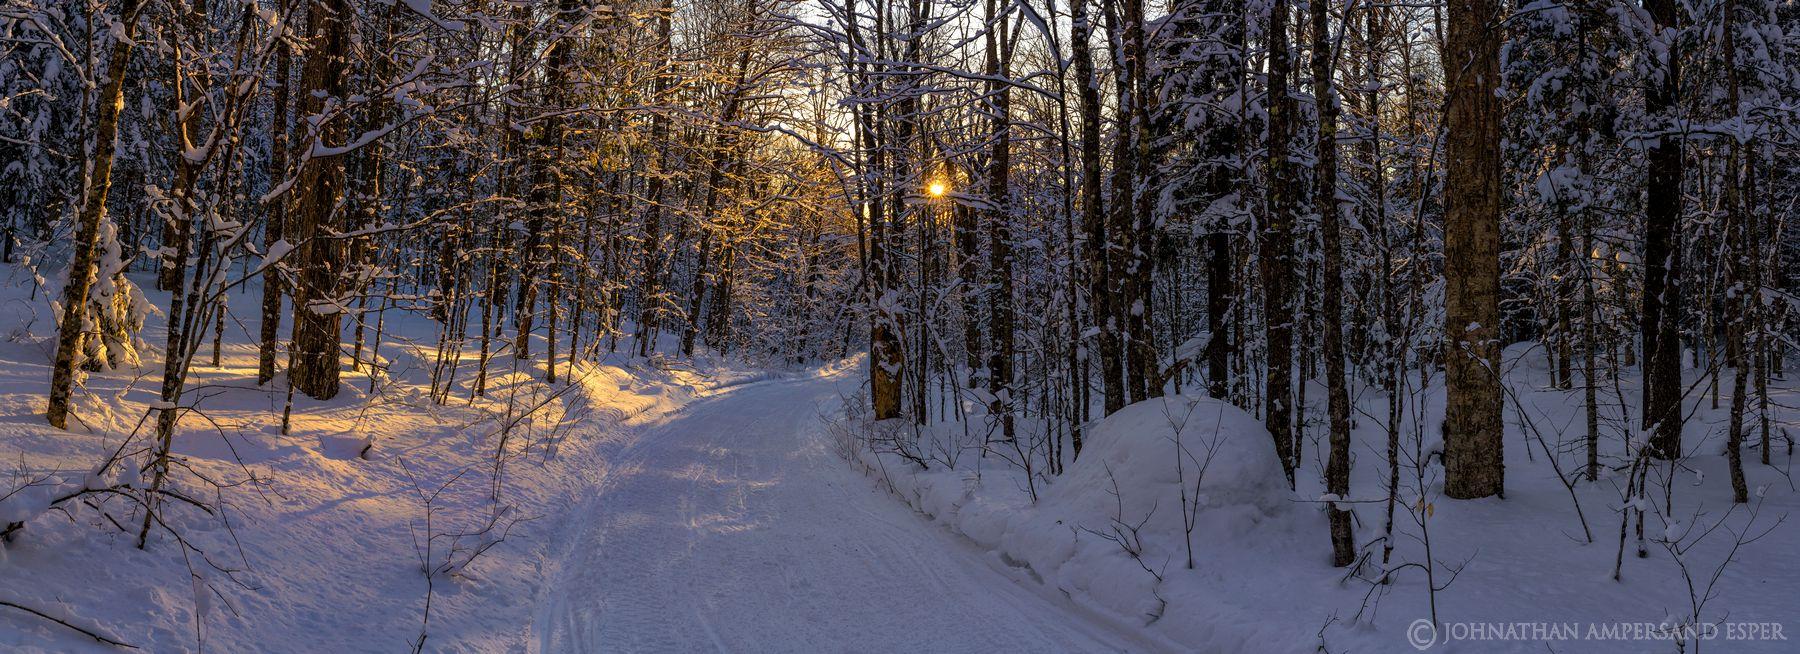 snowmobile trail,Debar Mt trail,Debar Mt,Debar Mt snowmobile trail,snowy forest,woods,winter,winter woods,